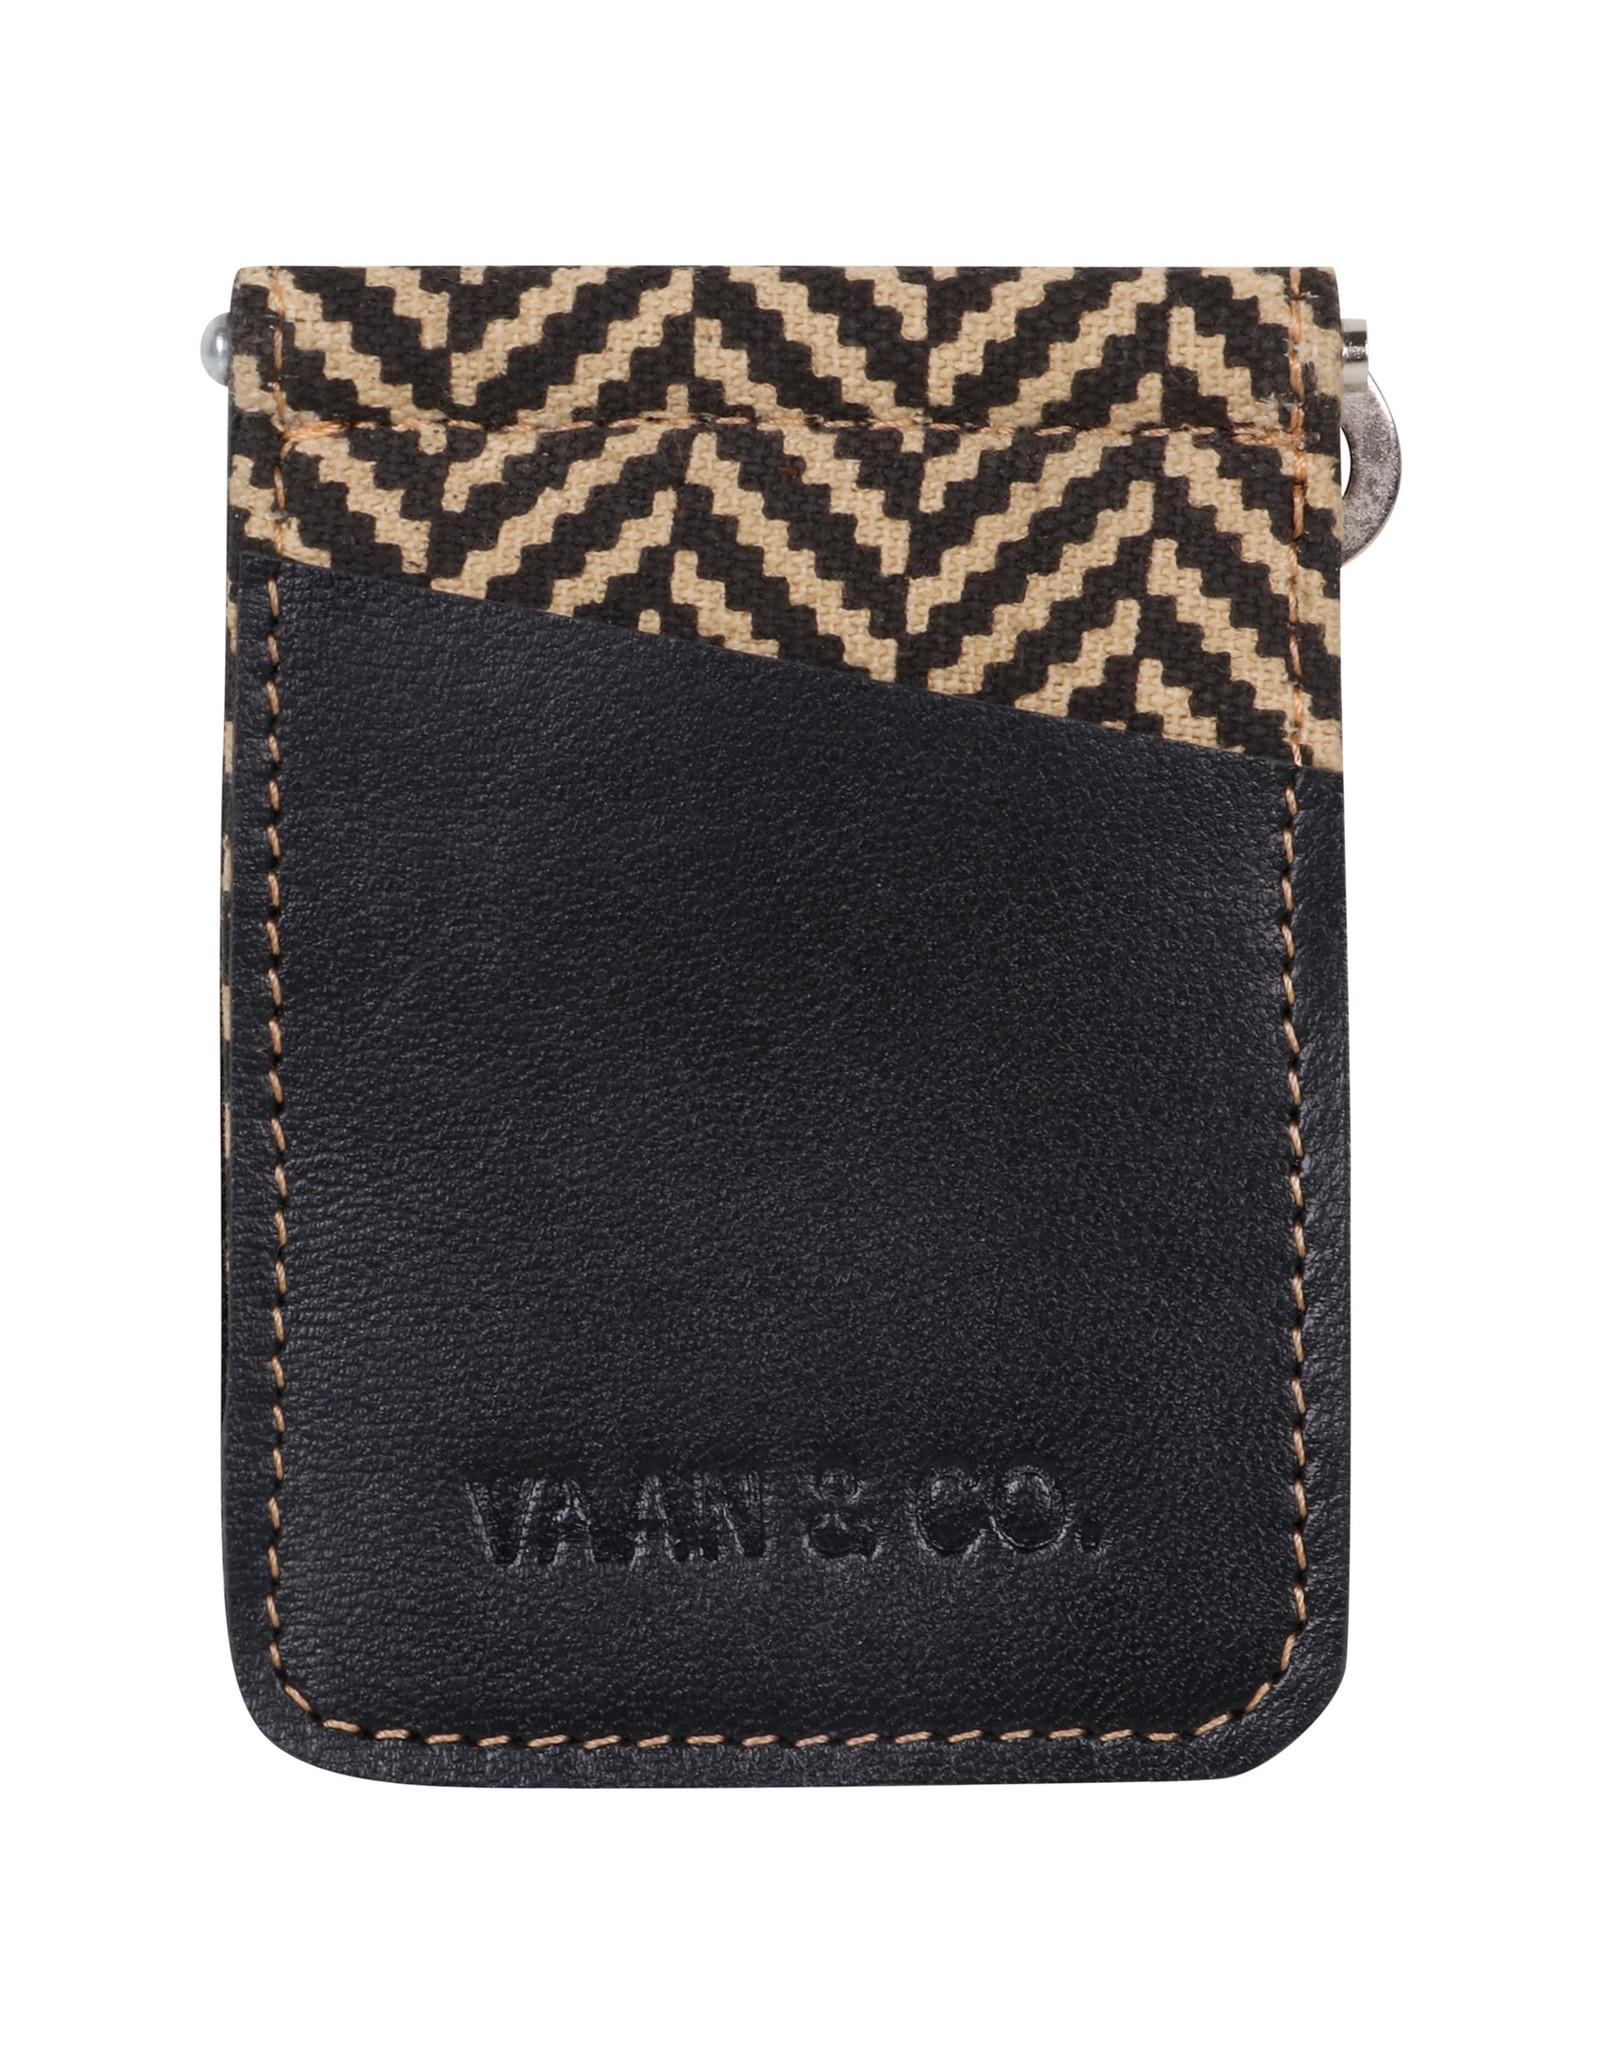 Vann & Co VG1027-P7 RFID Money Clip